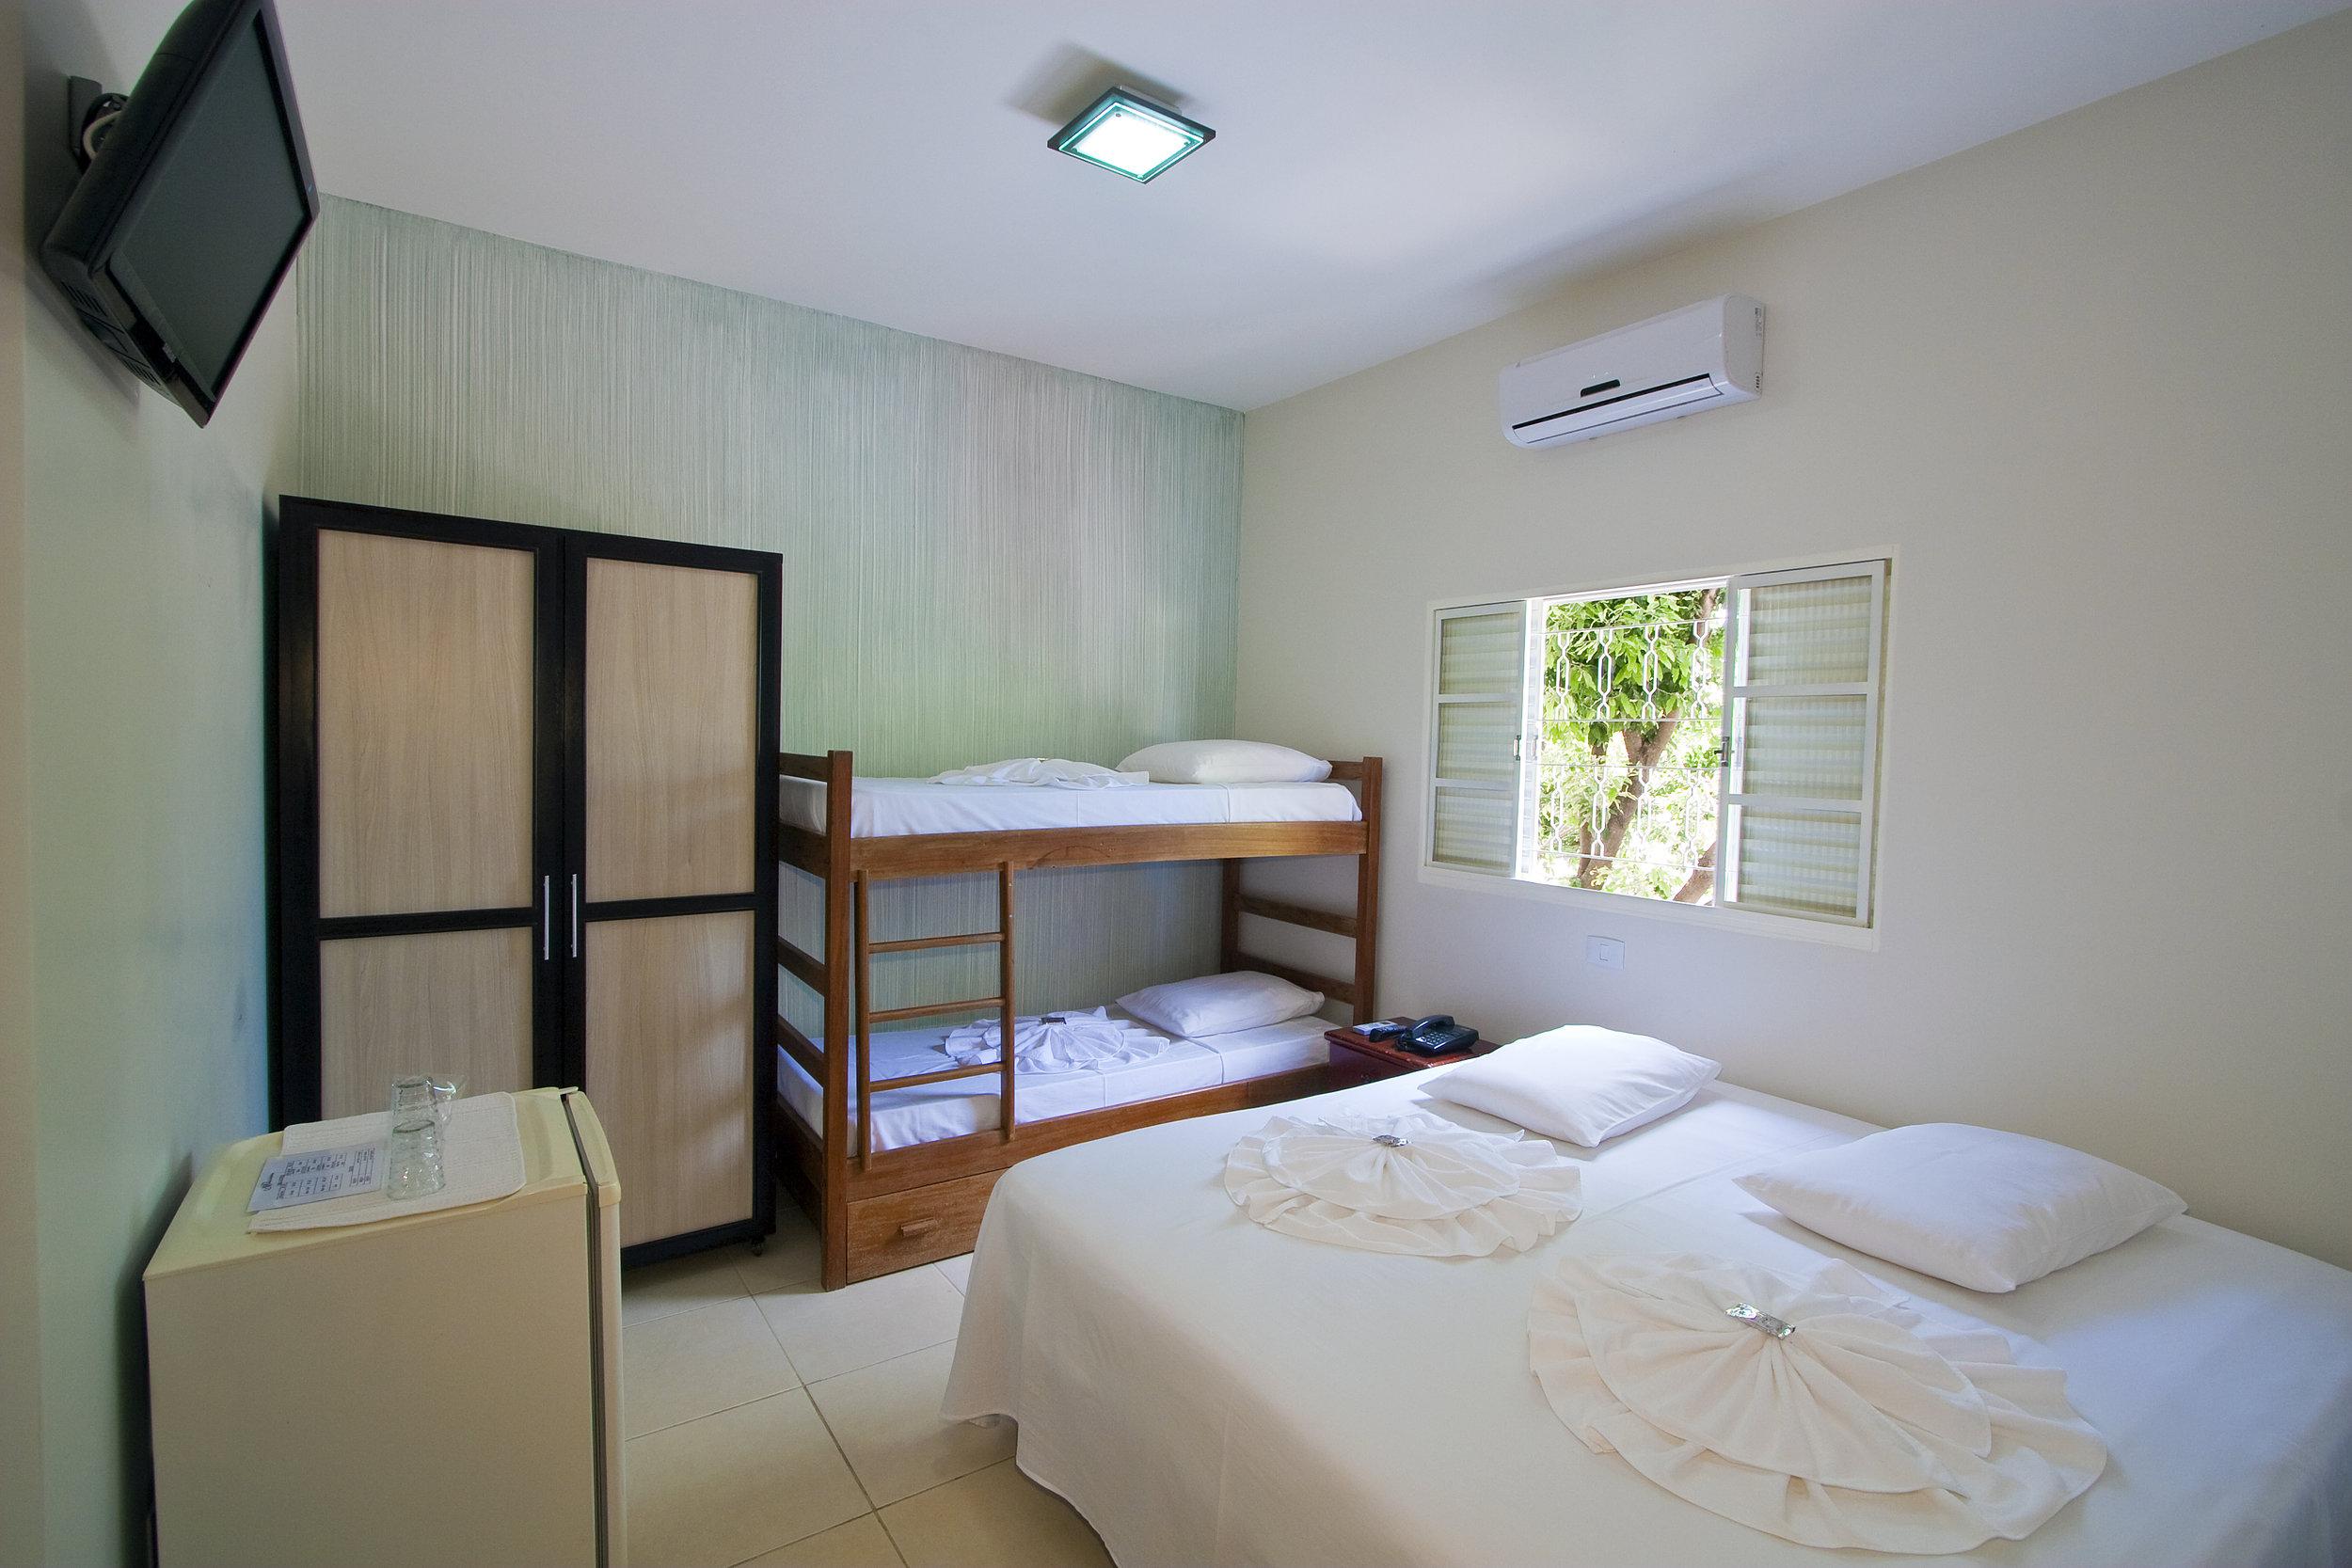 pousada_calliandra_apartamentos_20101224_0003.jpg